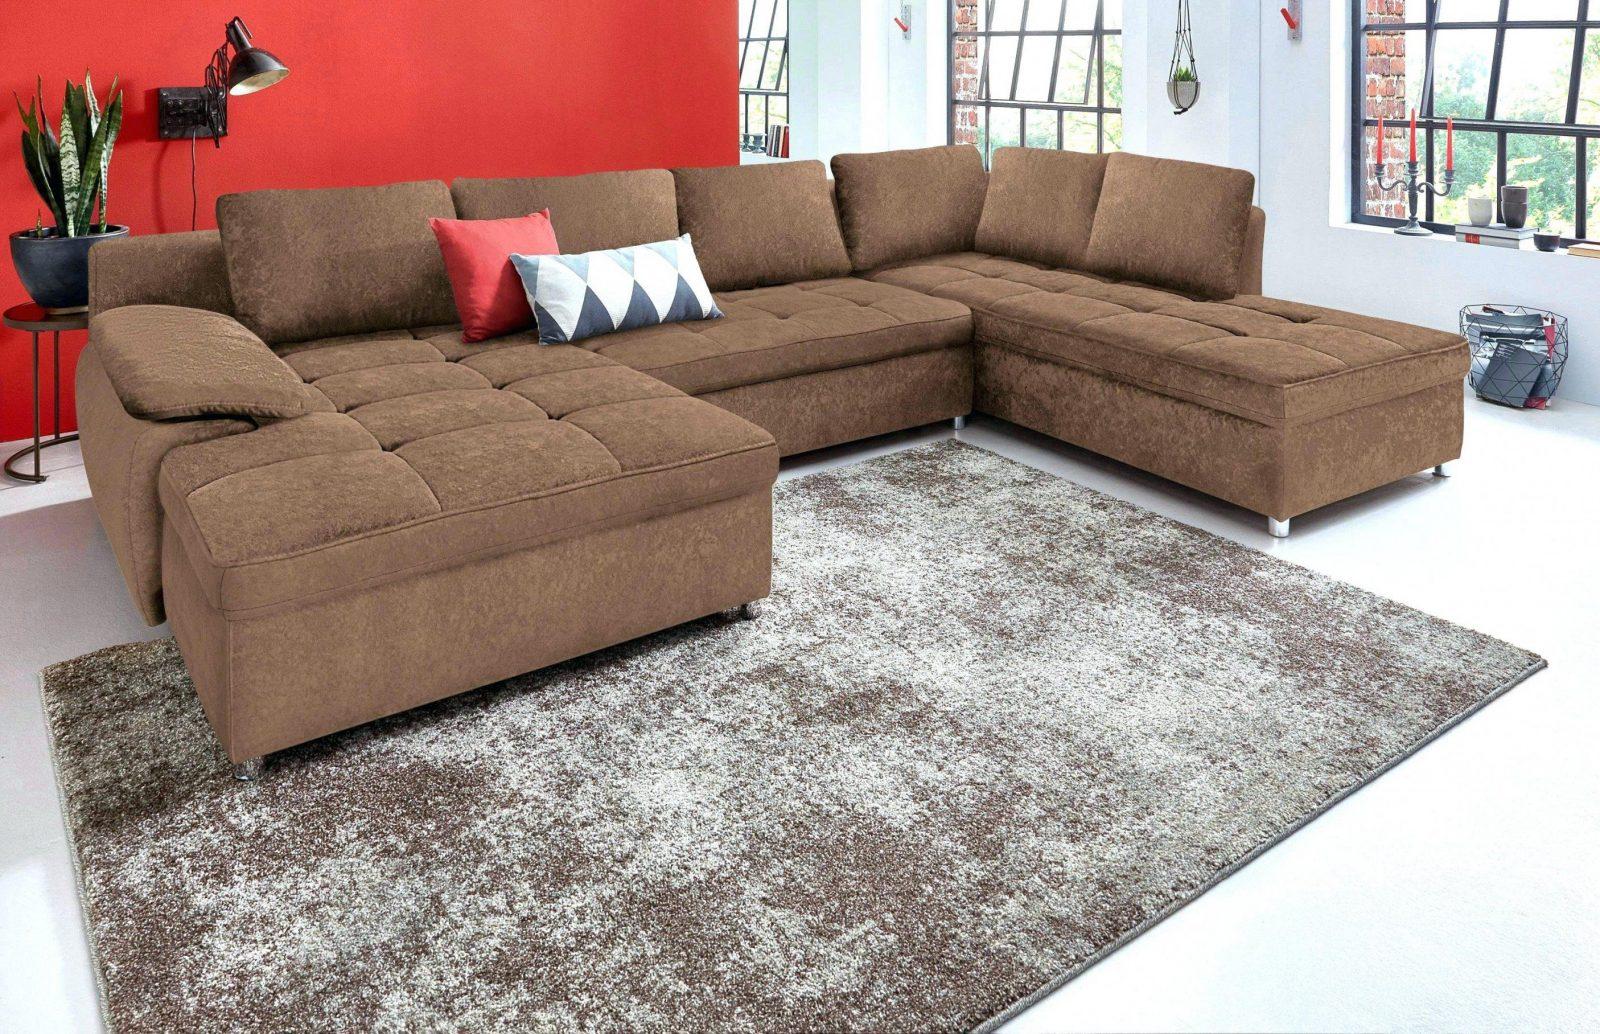 Otto Big Sofa Mit Stunning Cool Sofa Mit Beleuchtung Otto With Big von Otto Big Sofa Mit Bettfunktion Photo